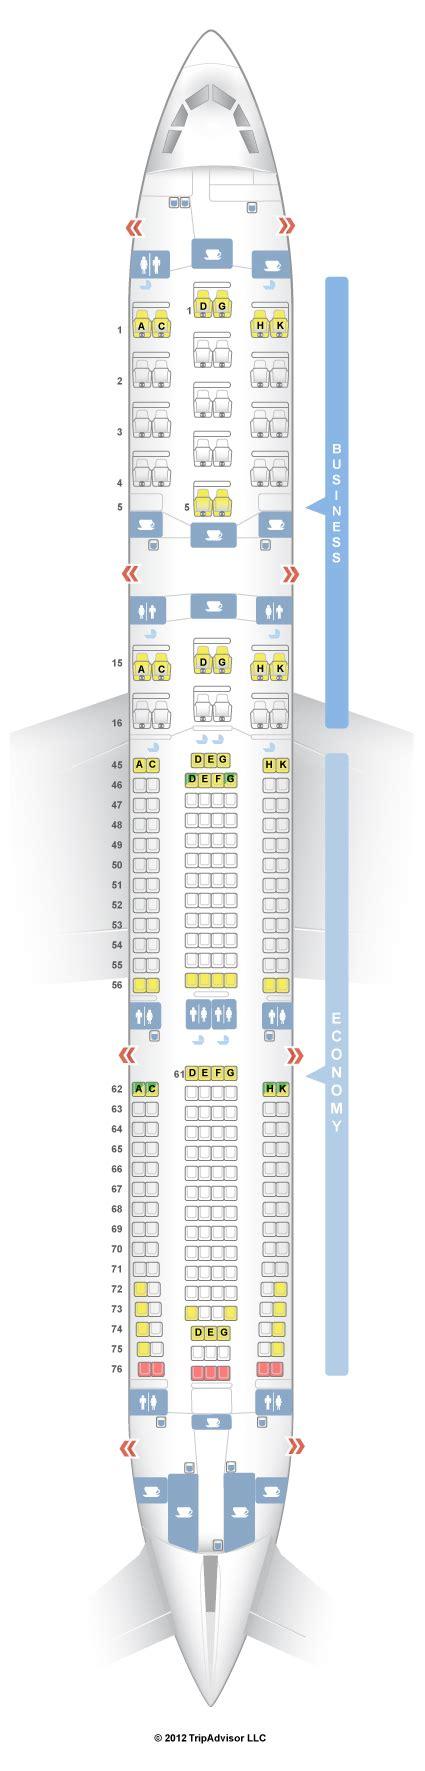 SeatGuru Seat Map South African Airways